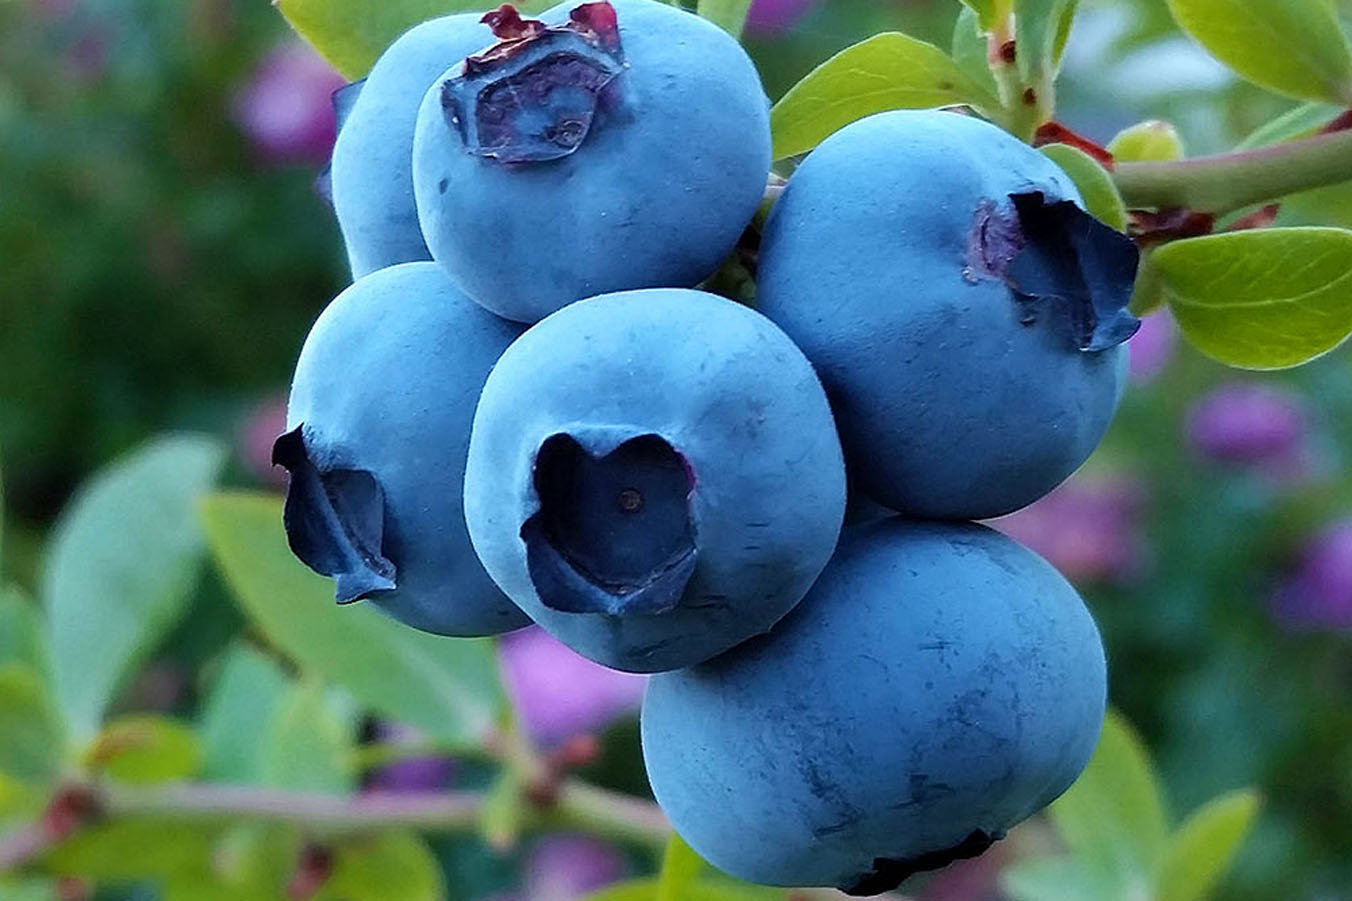 The webinar Blueberries in Easter Europe, long-term blueberry market outlook for the Eastern Europe